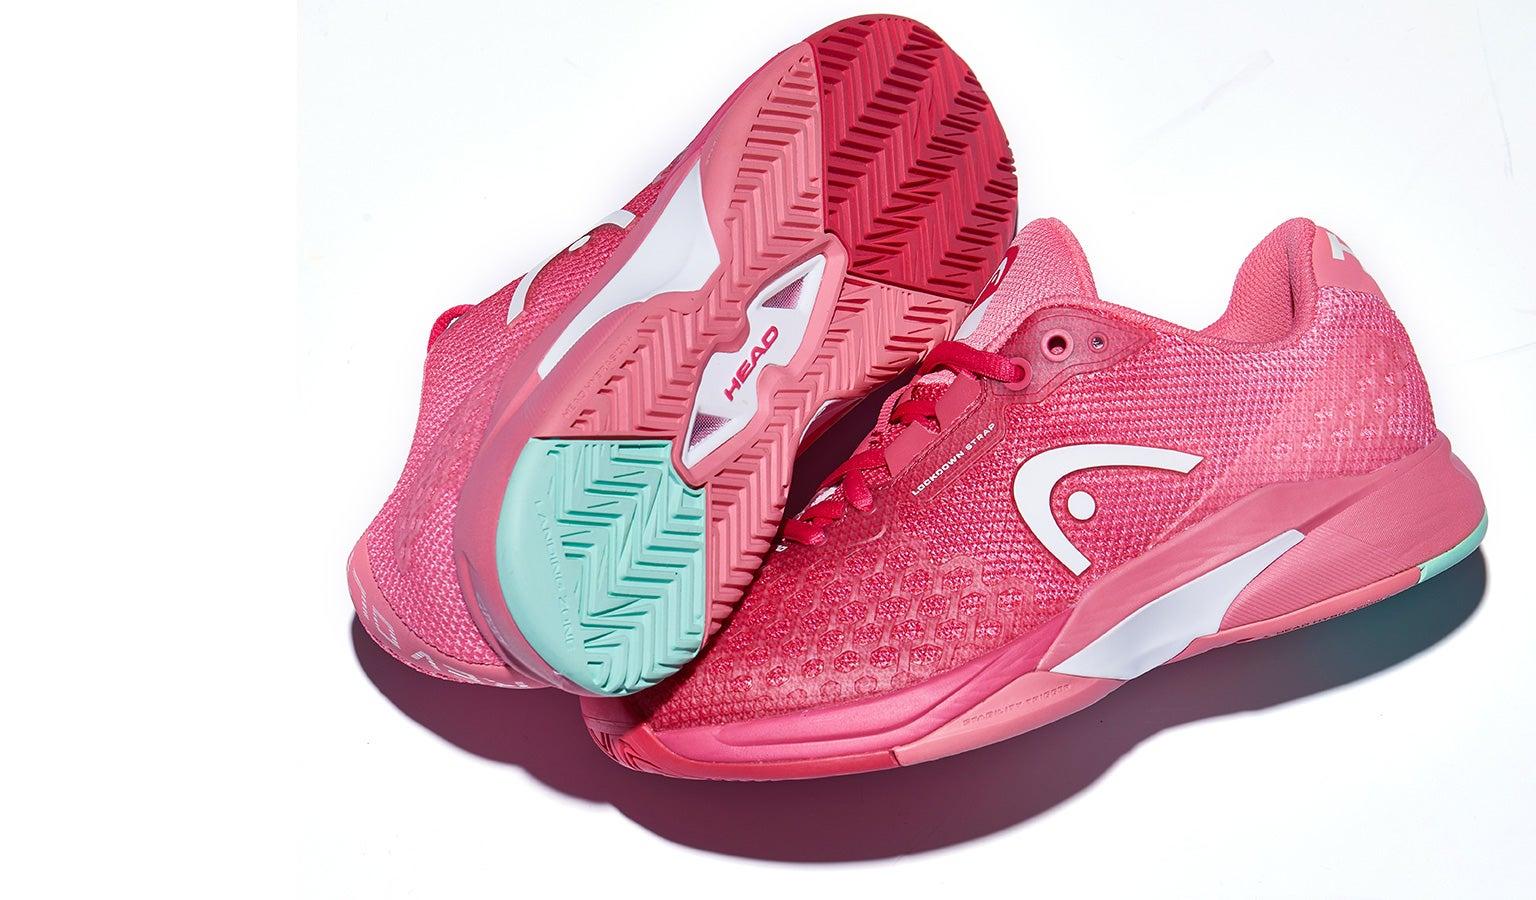 90fbb77e29b Tennis Warehouse - Head Revolt Pro 3.0 White Grey Women s Shoes Review